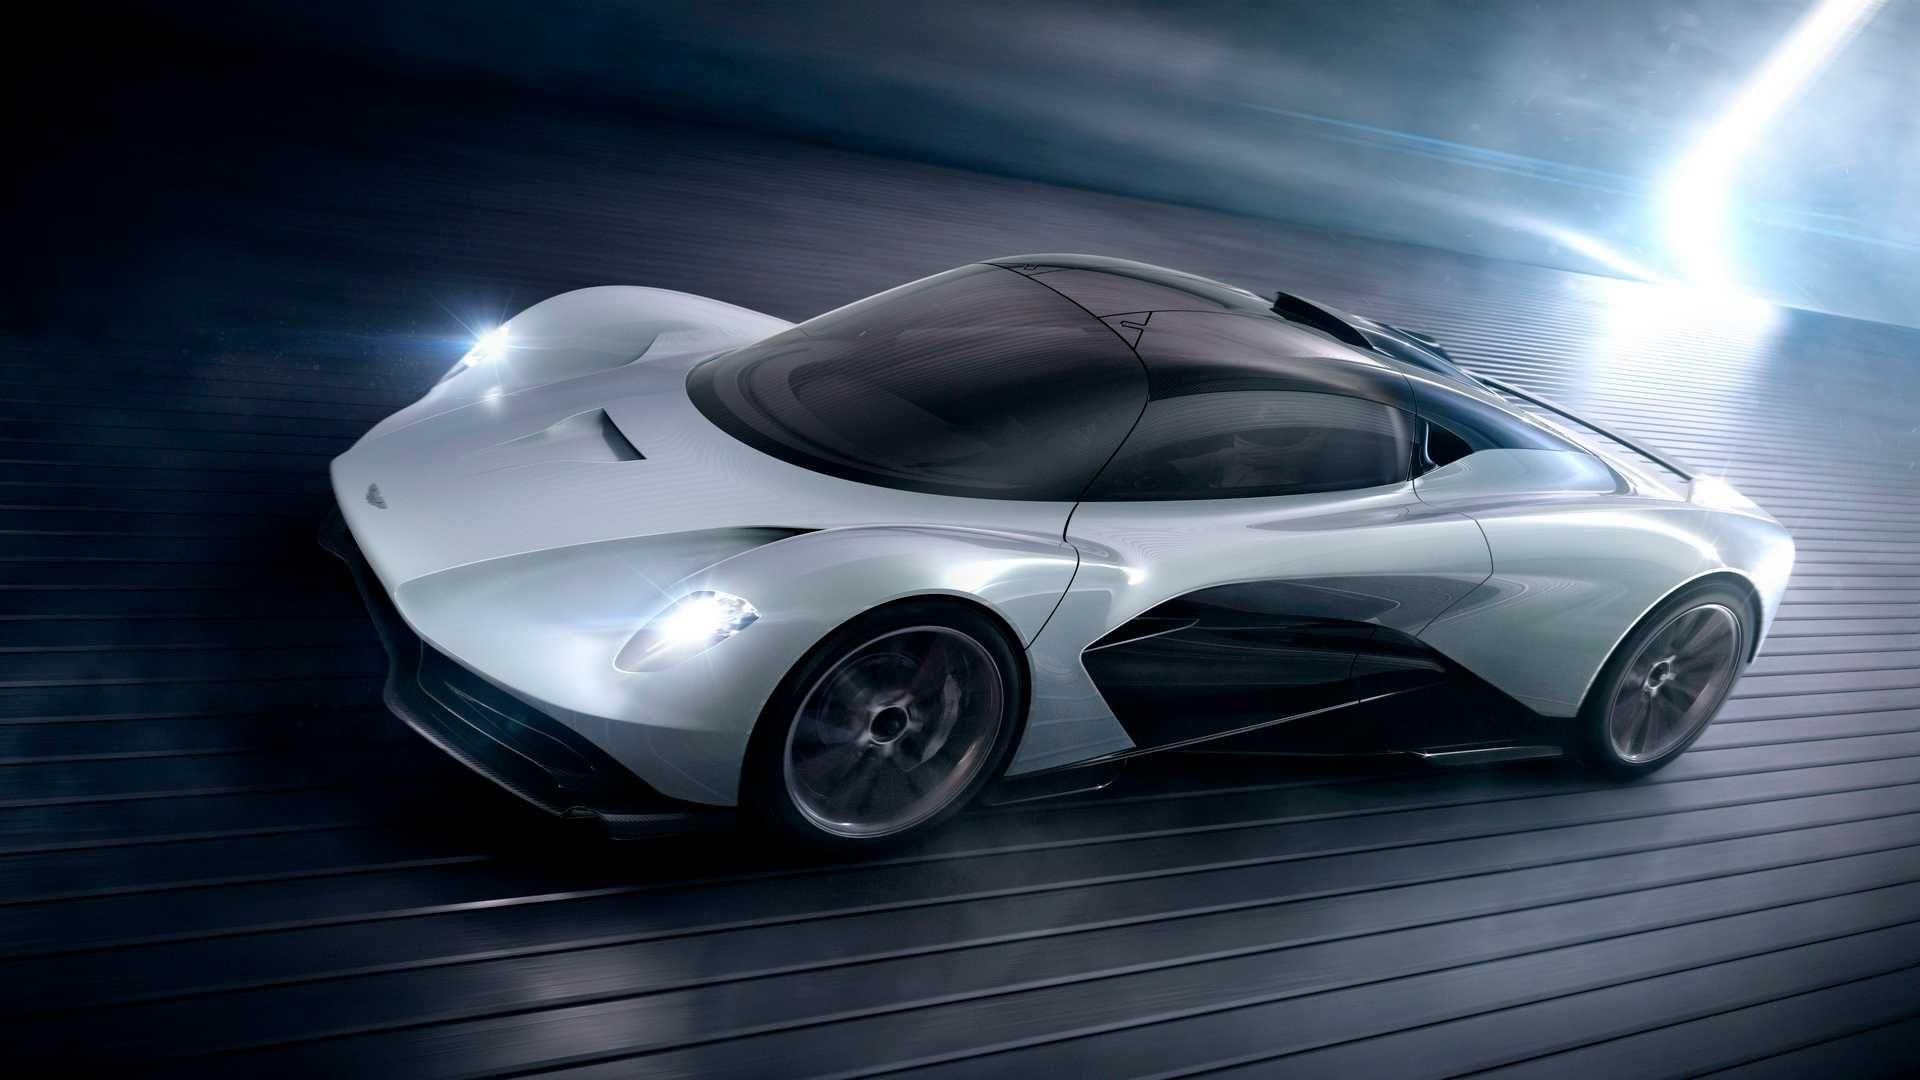 Aston Martin Valhalla Name Confirmed For Am Rb 003 Hypercar